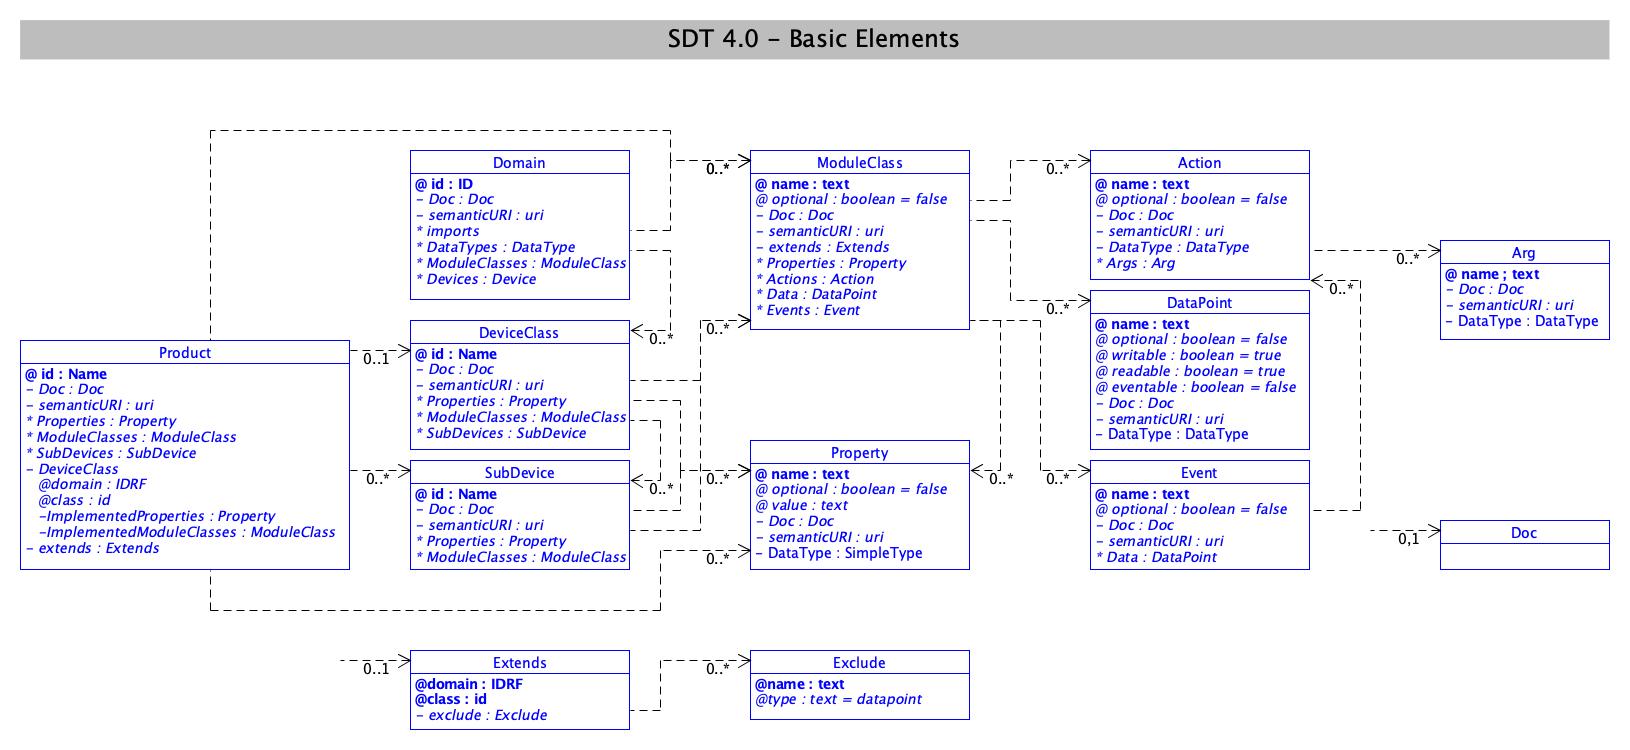 SDT/schema4.0/docs/images/SDT_UML_Basic_Elements.png